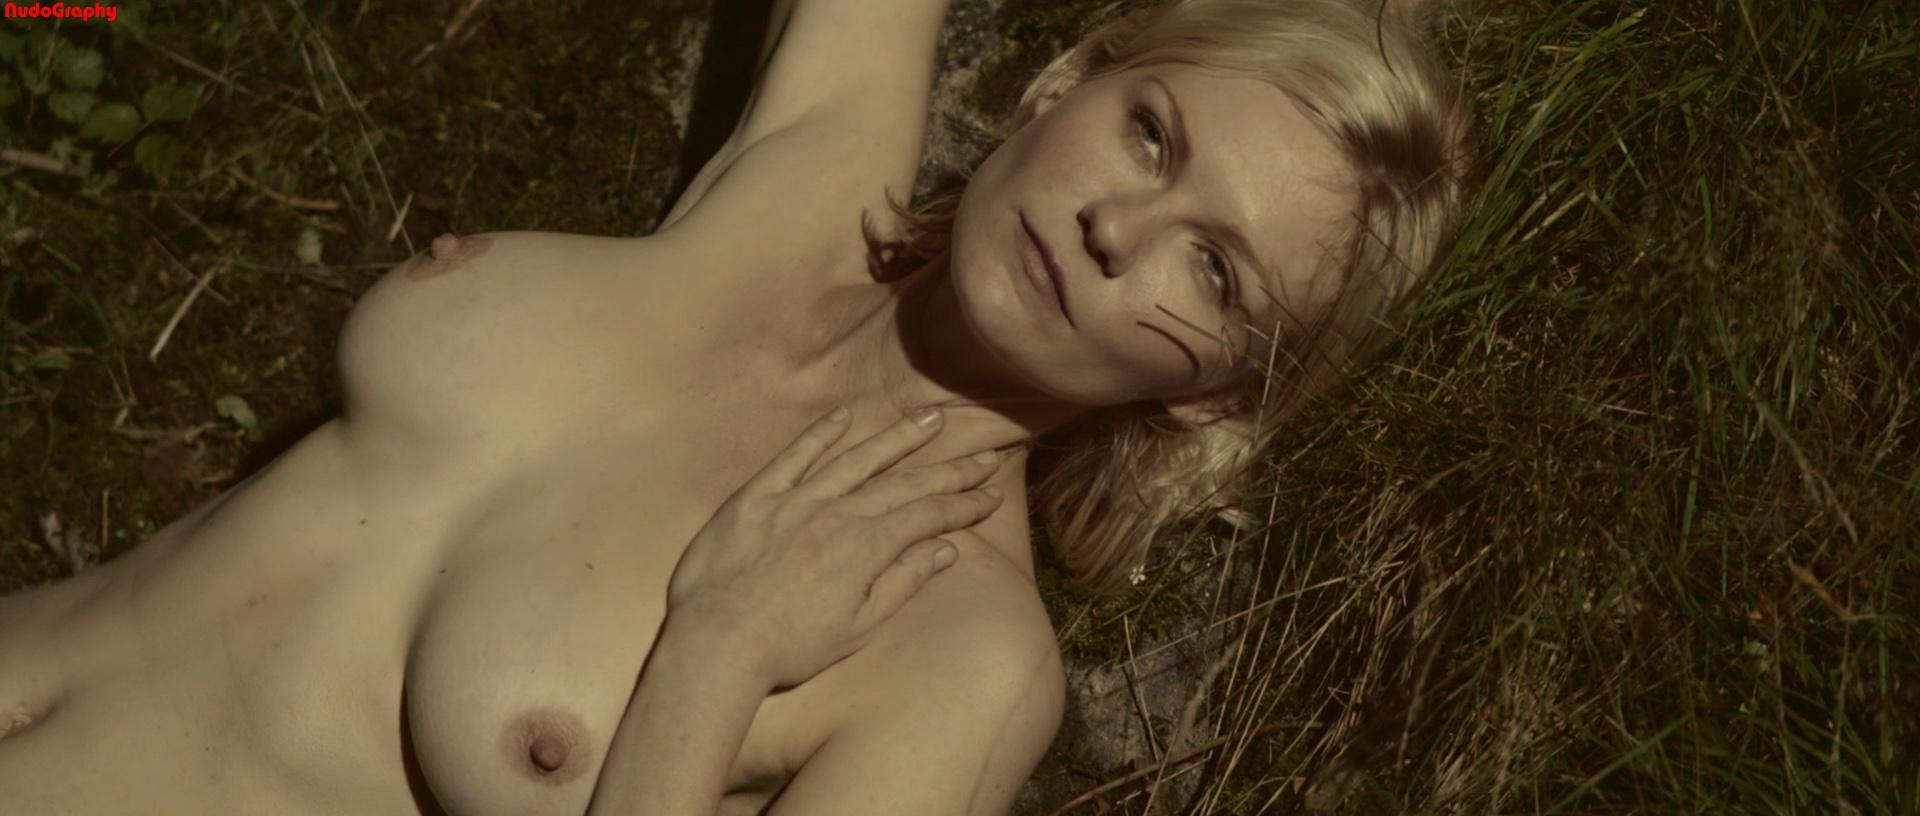 Oxana chic nude in roll in the hay metart model gallery